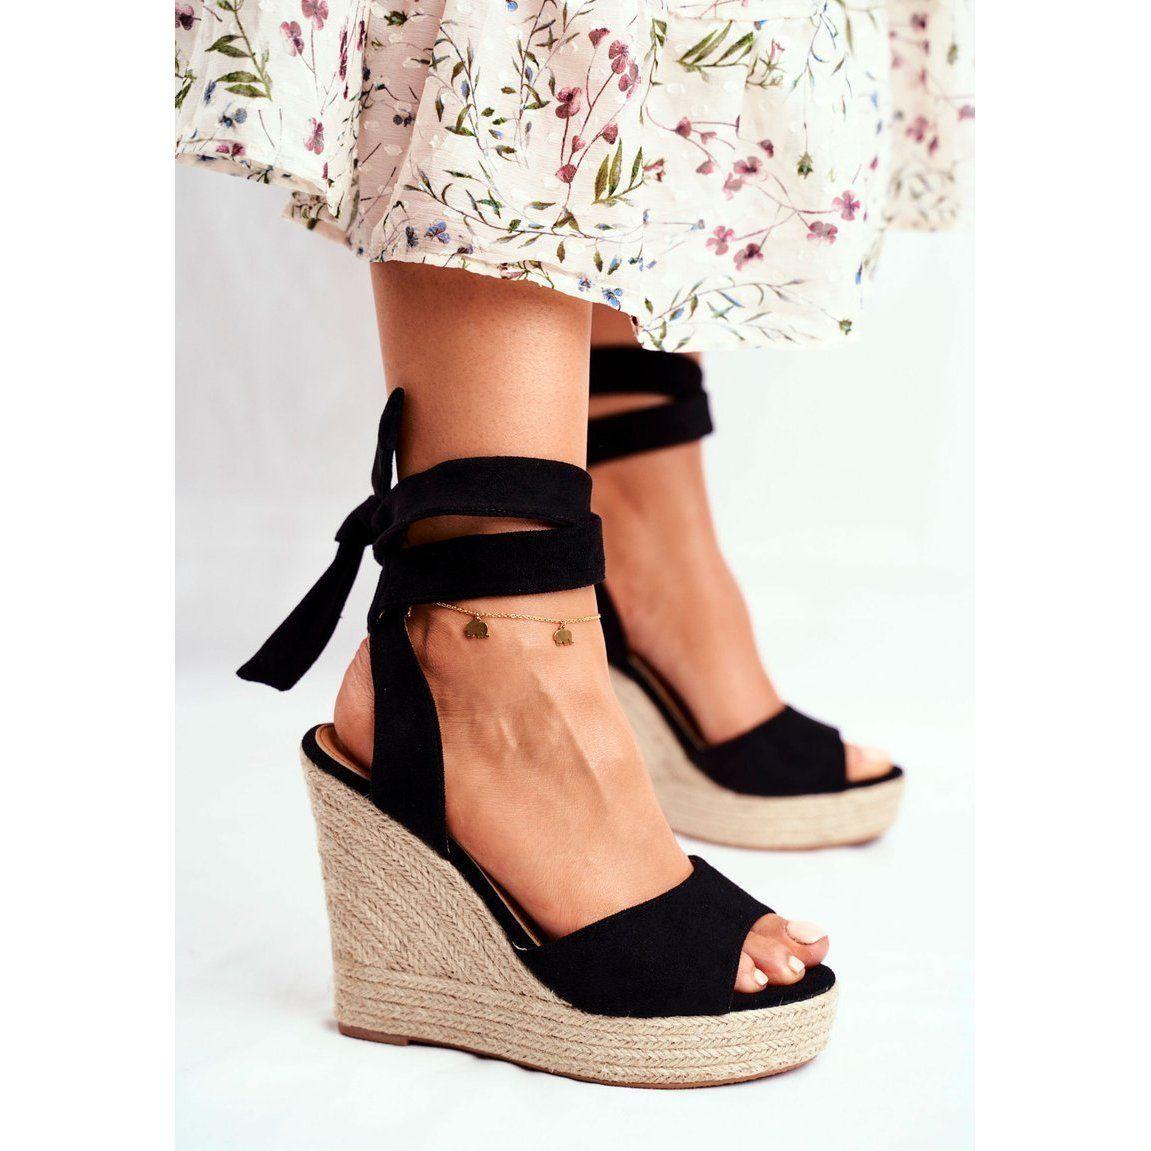 Sea Sandaly Damskie Na Koturnie Wiazane Czarne Belleza Wedge Sandals Wedges Wedge Espadrille